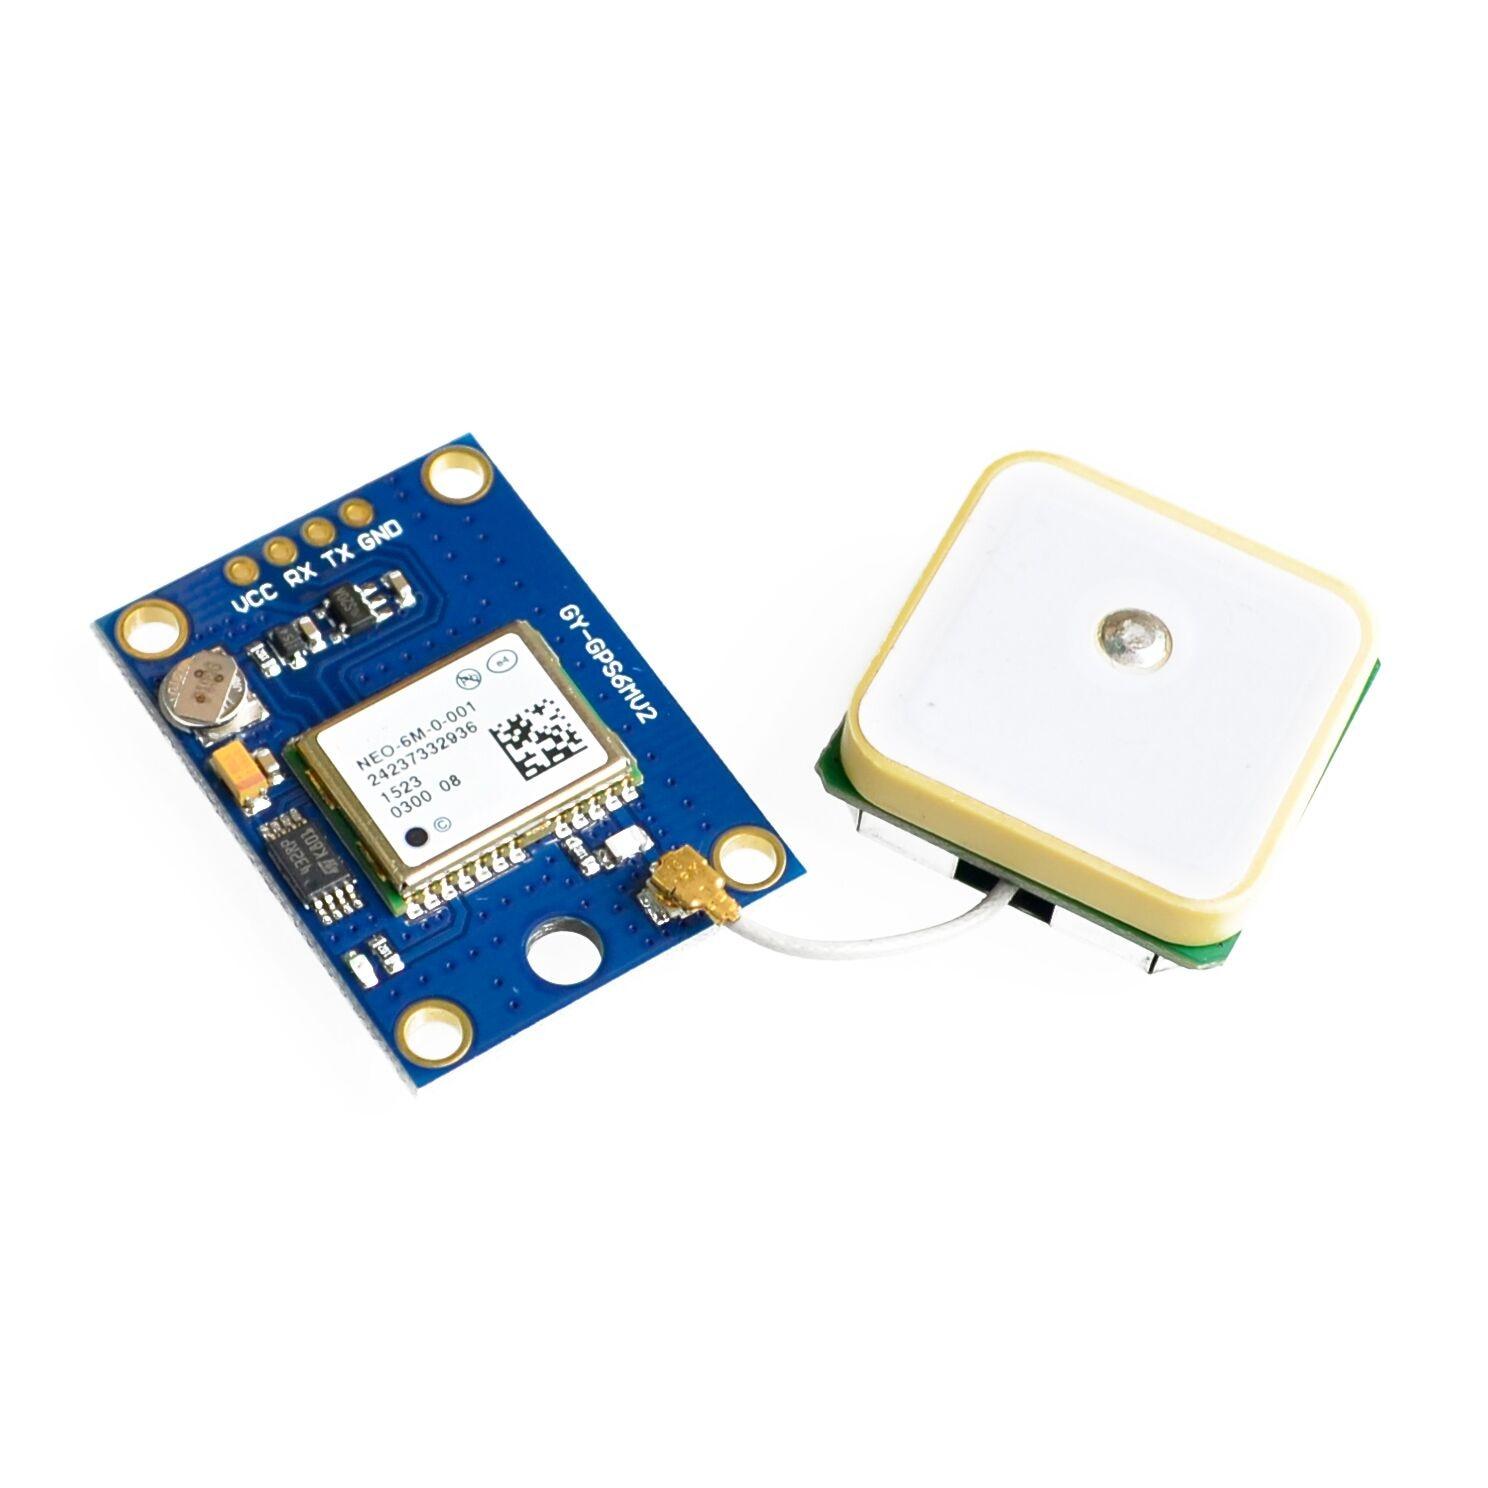 10pcs lot GY NEO6MV2 new GPS module NEO6MV2 with Flight Control EEPROM MWC APM2 5